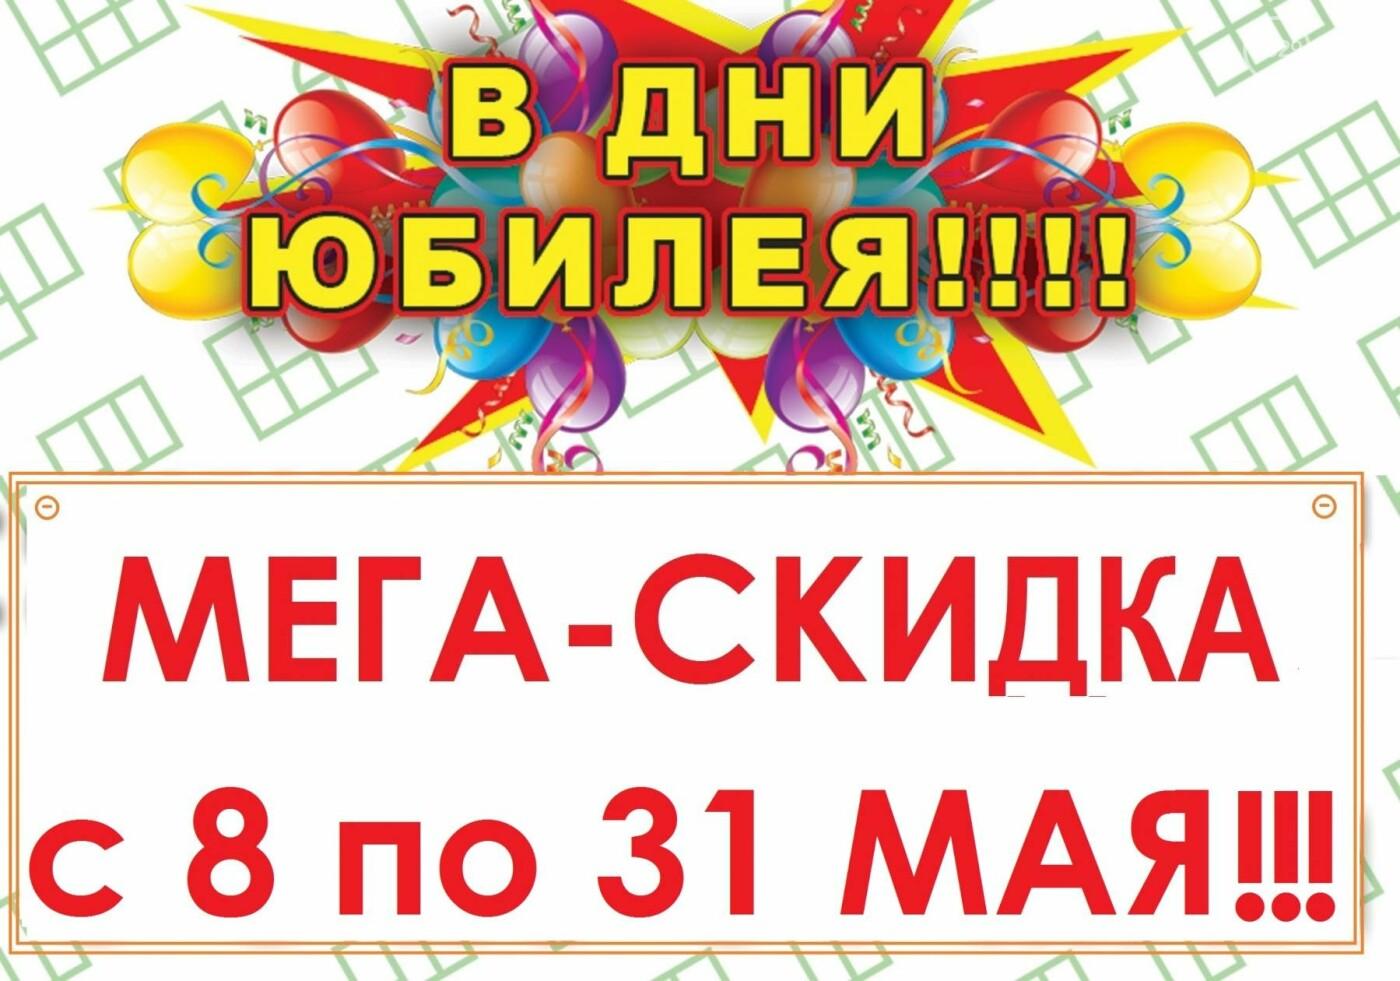 «ЦЕНТР ОКОН» - приглашает с 8 по 31 мая всех мариупольцев на ЮБИЛЕЙ! СУПЕР ПРЕДЛОЖЕНИЕ на окна, балконы и лоджии, по акции МЕГА-СКИДКА!, фото-1